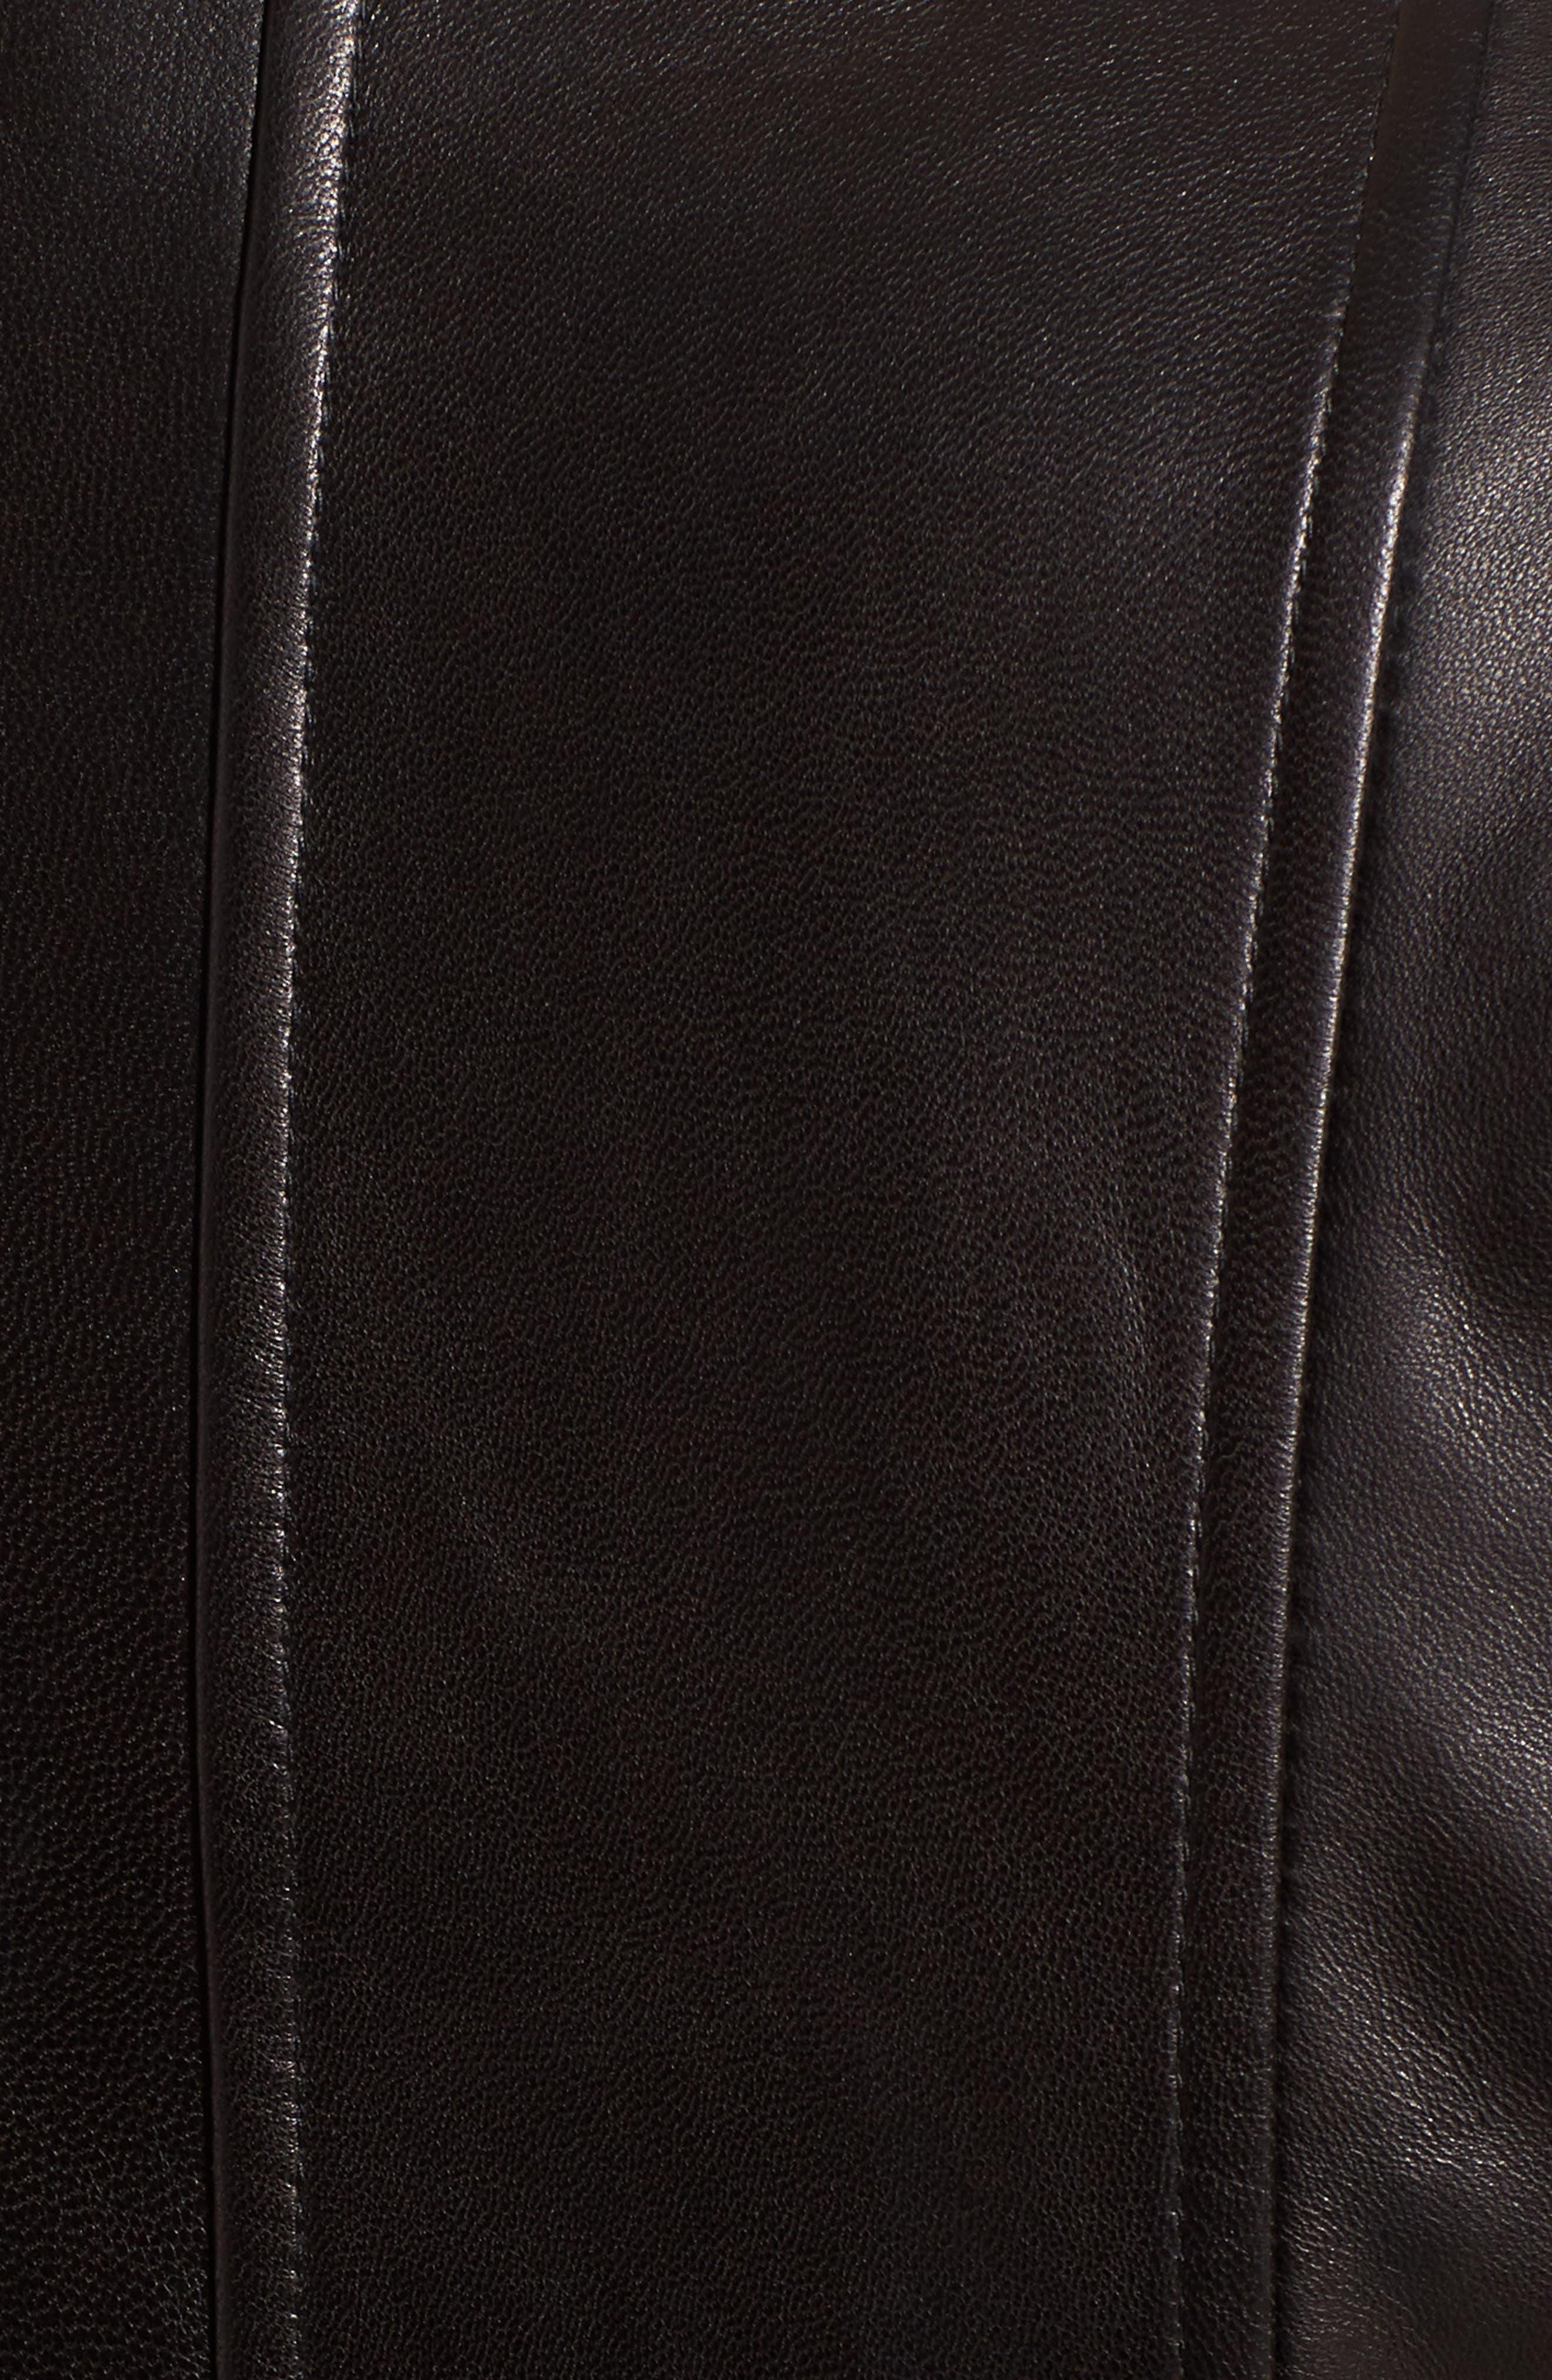 Seam Leather Jacket,                             Alternate thumbnail 6, color,                             Black